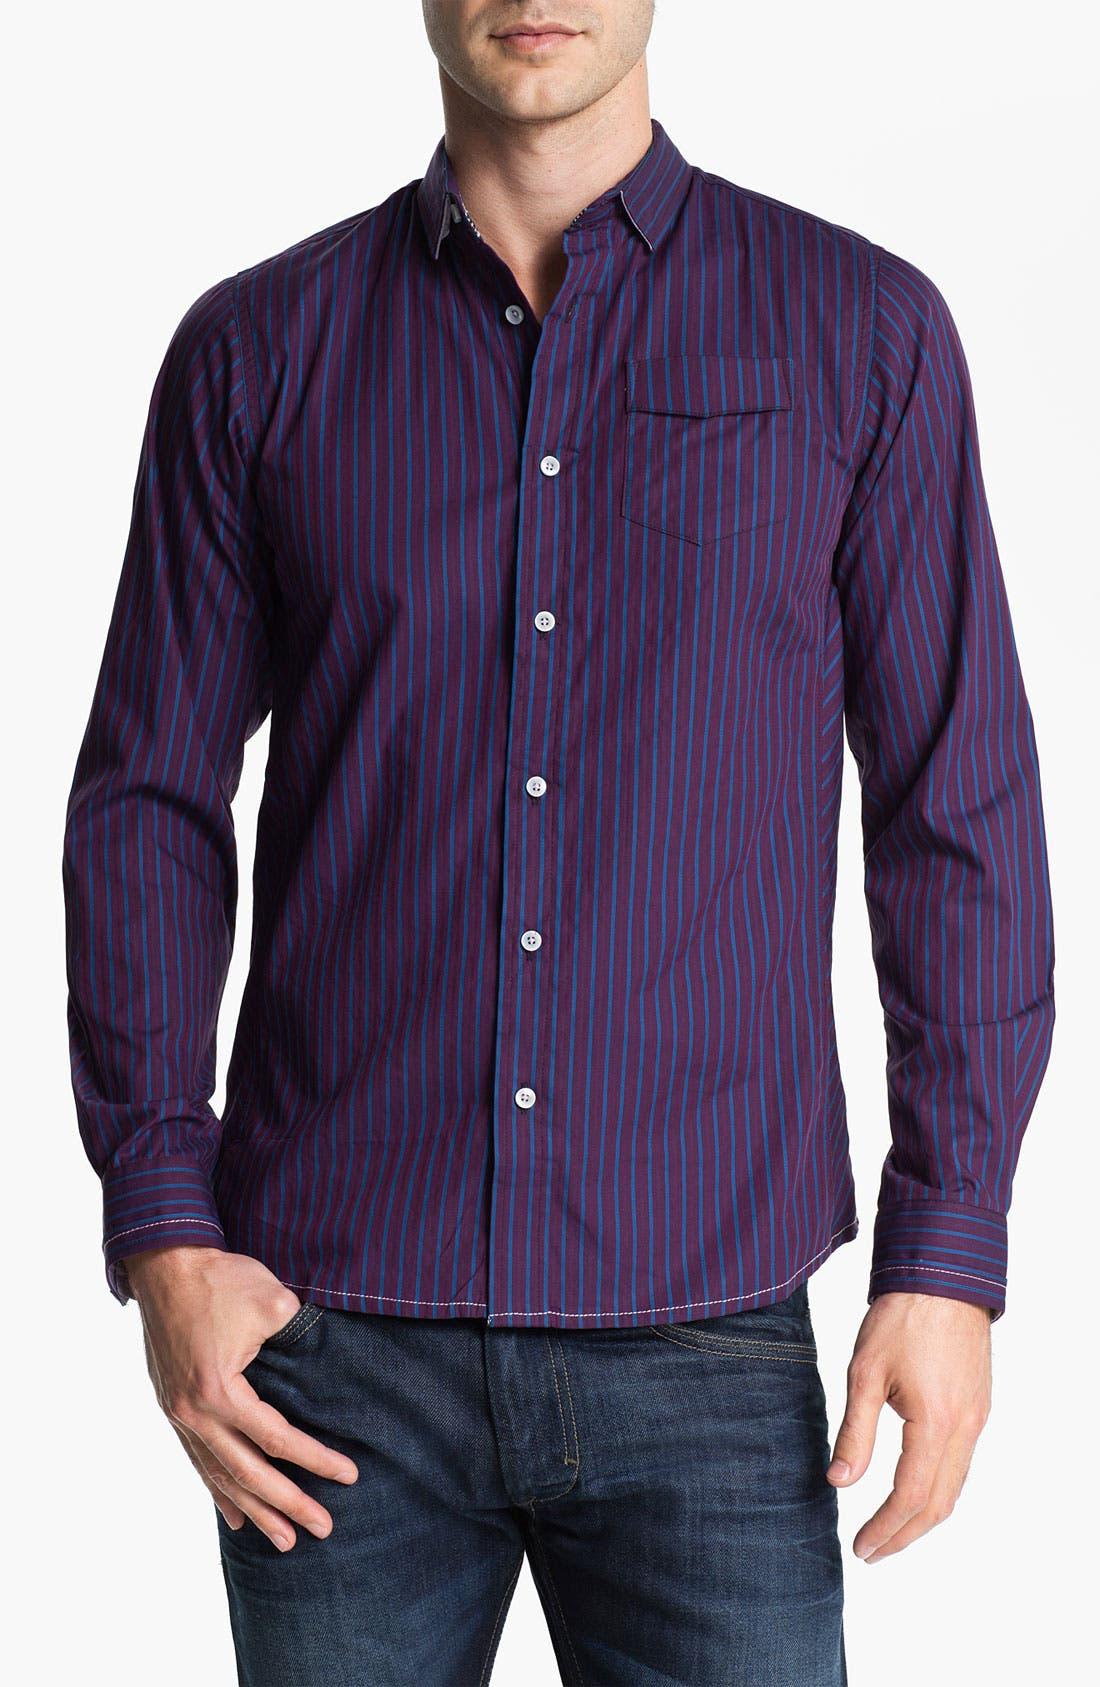 Main Image - Descendant of Thieves Stripe Woven Shirt